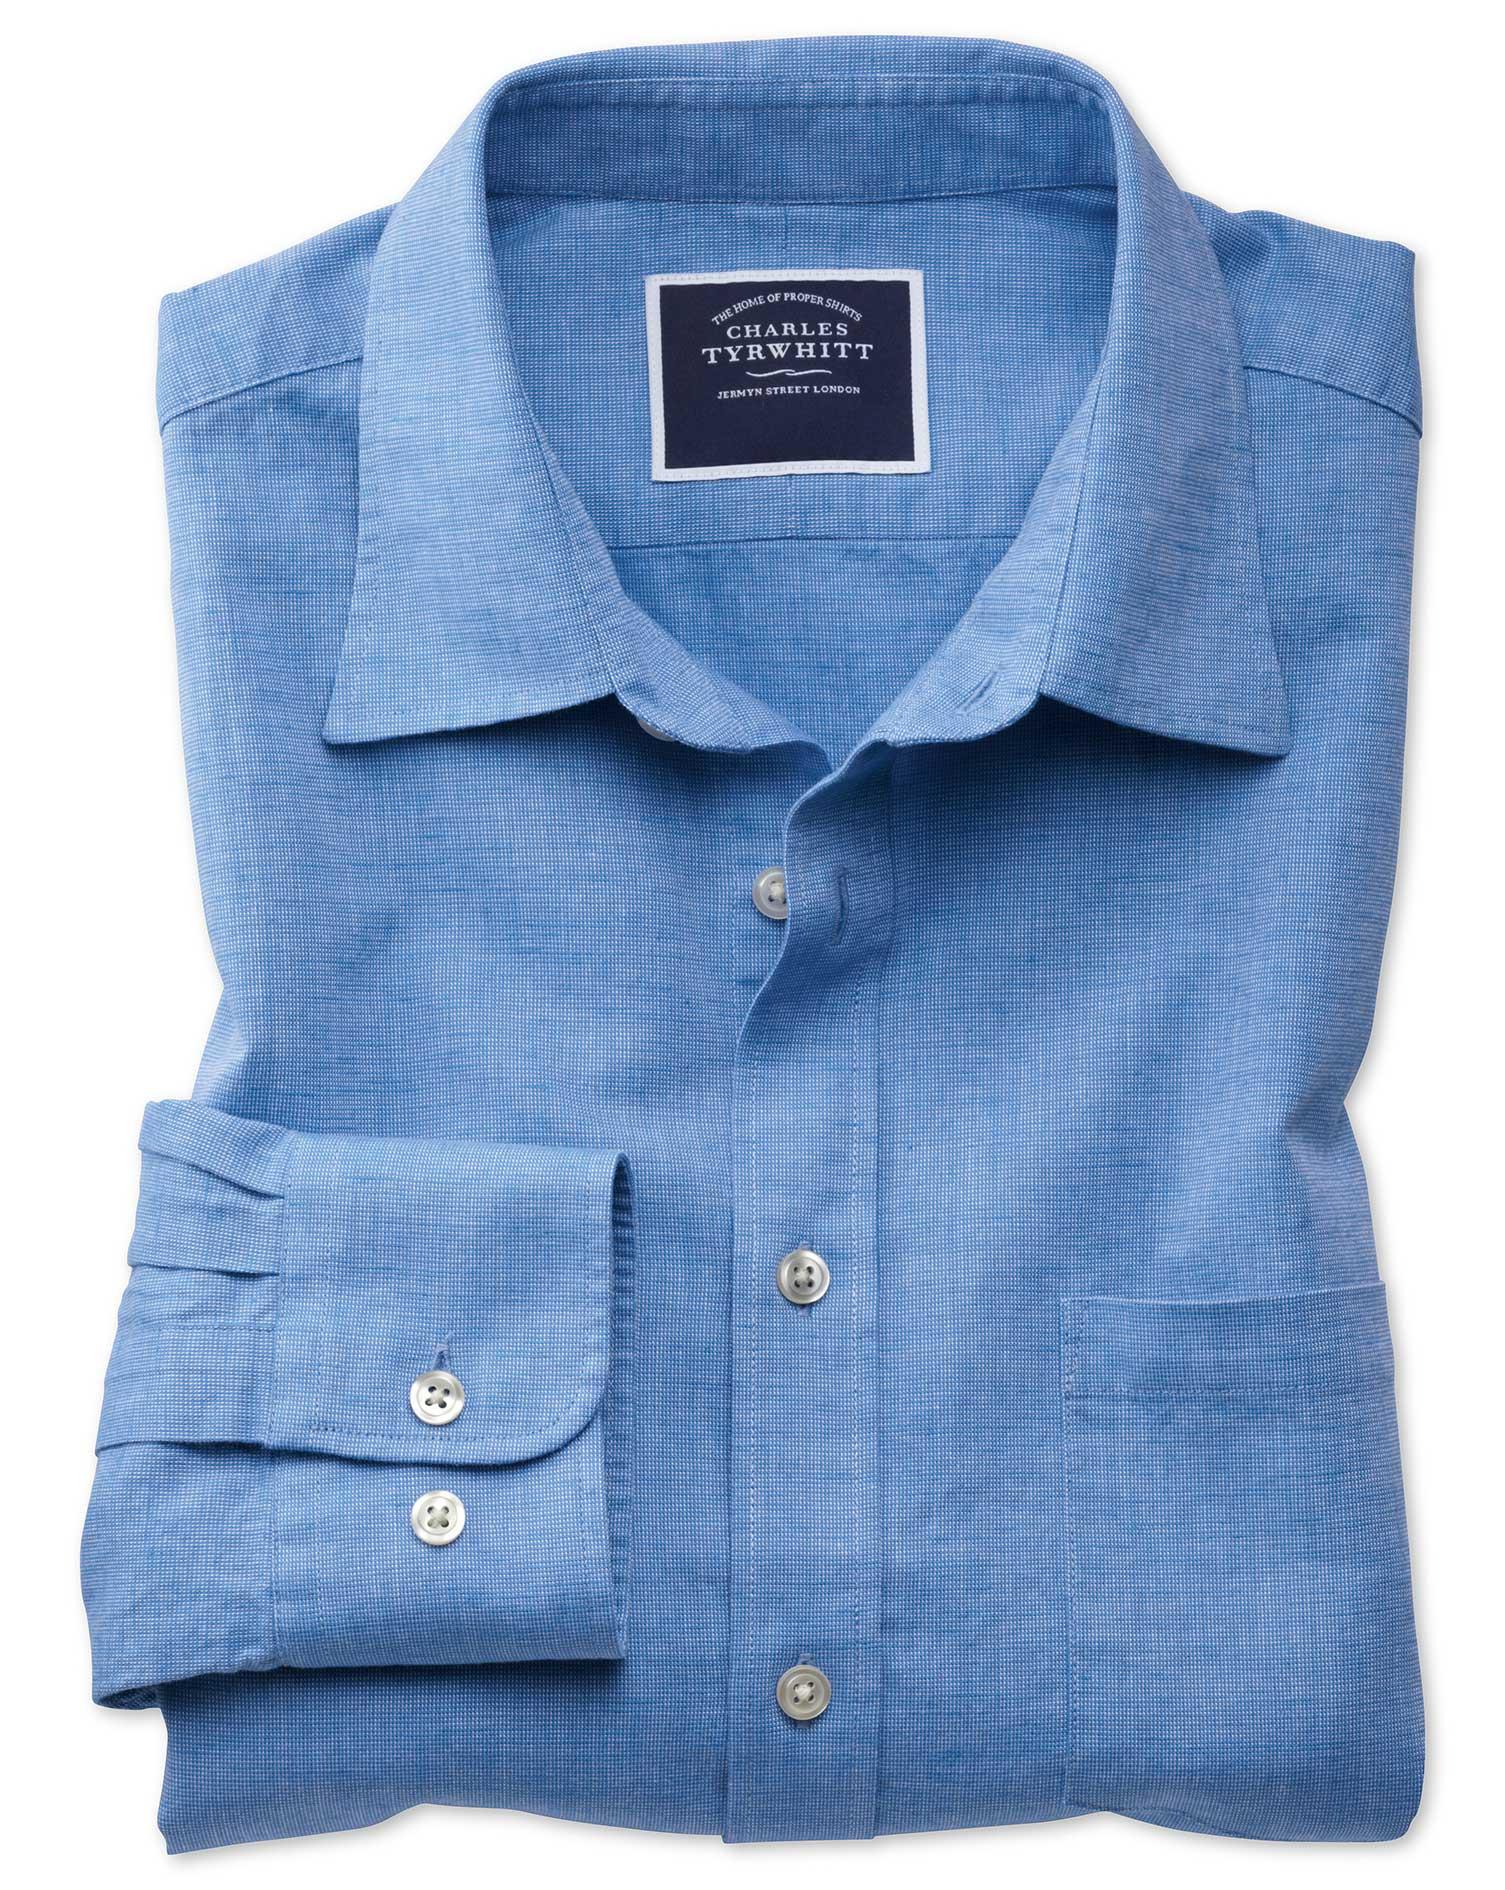 Slim Fit Cotton Linen Bright Blue Plain Shirt Single Cuff Size Medium by Charles Tyrwhitt